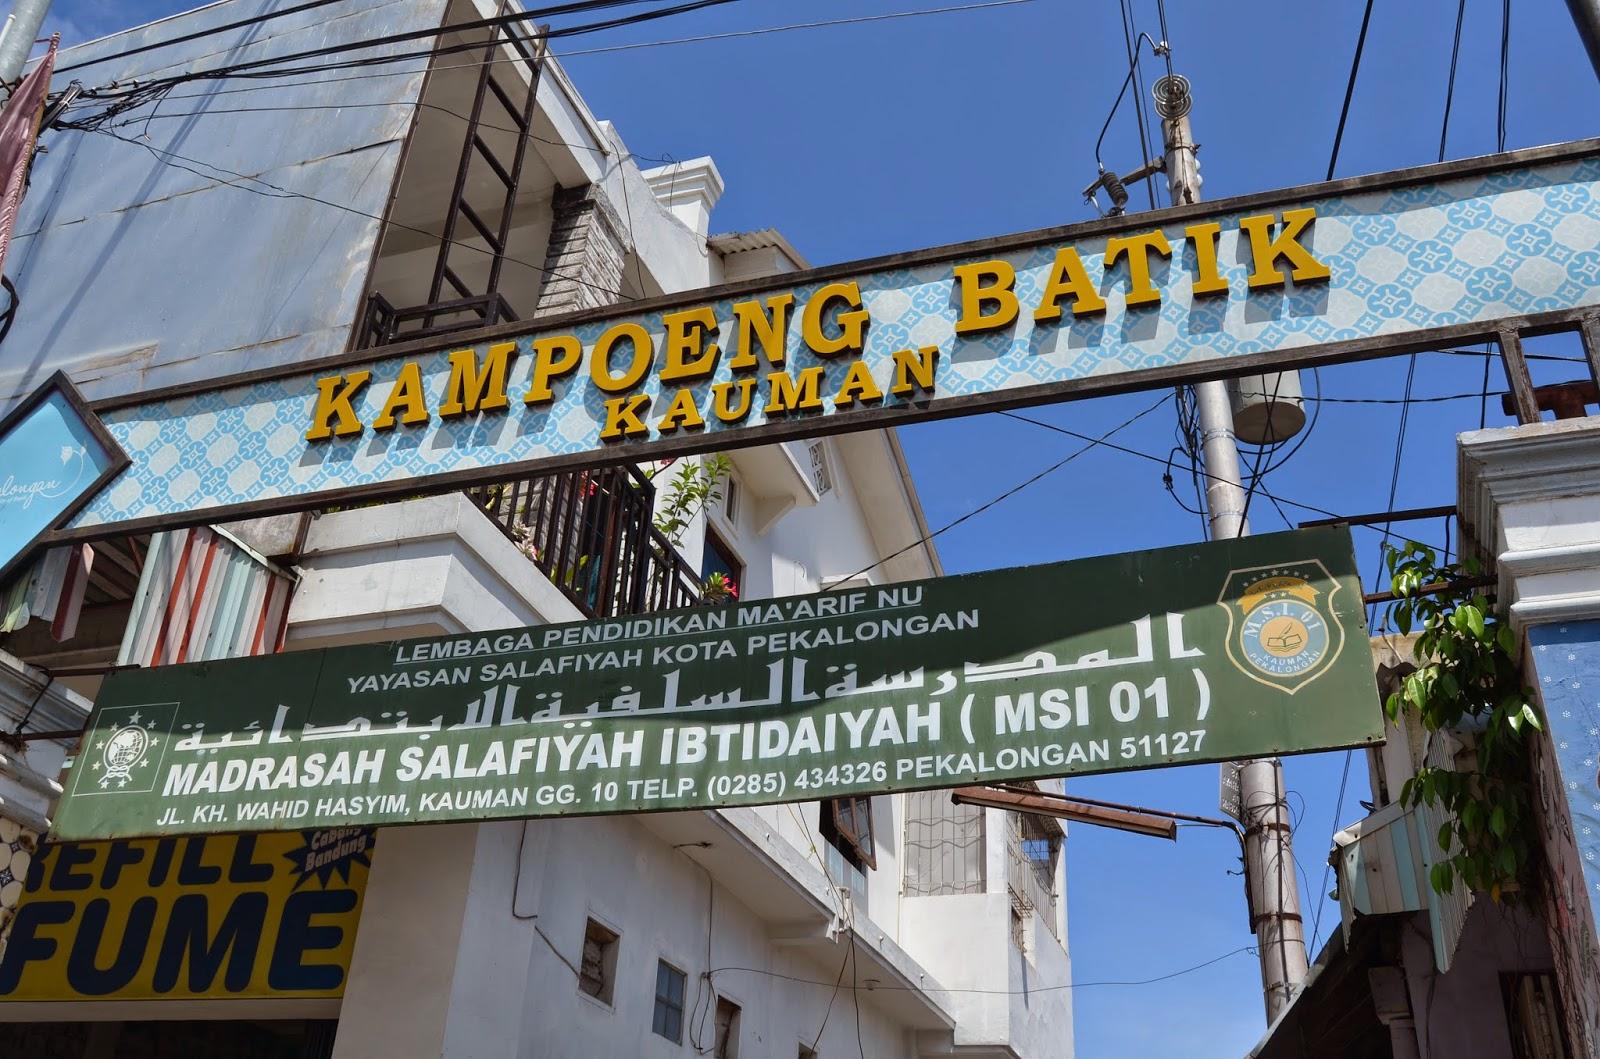 Berburu Batik Rekomendasi Kampung Bisa Kamu Kunjungi Wisata Kampoeng Jetis